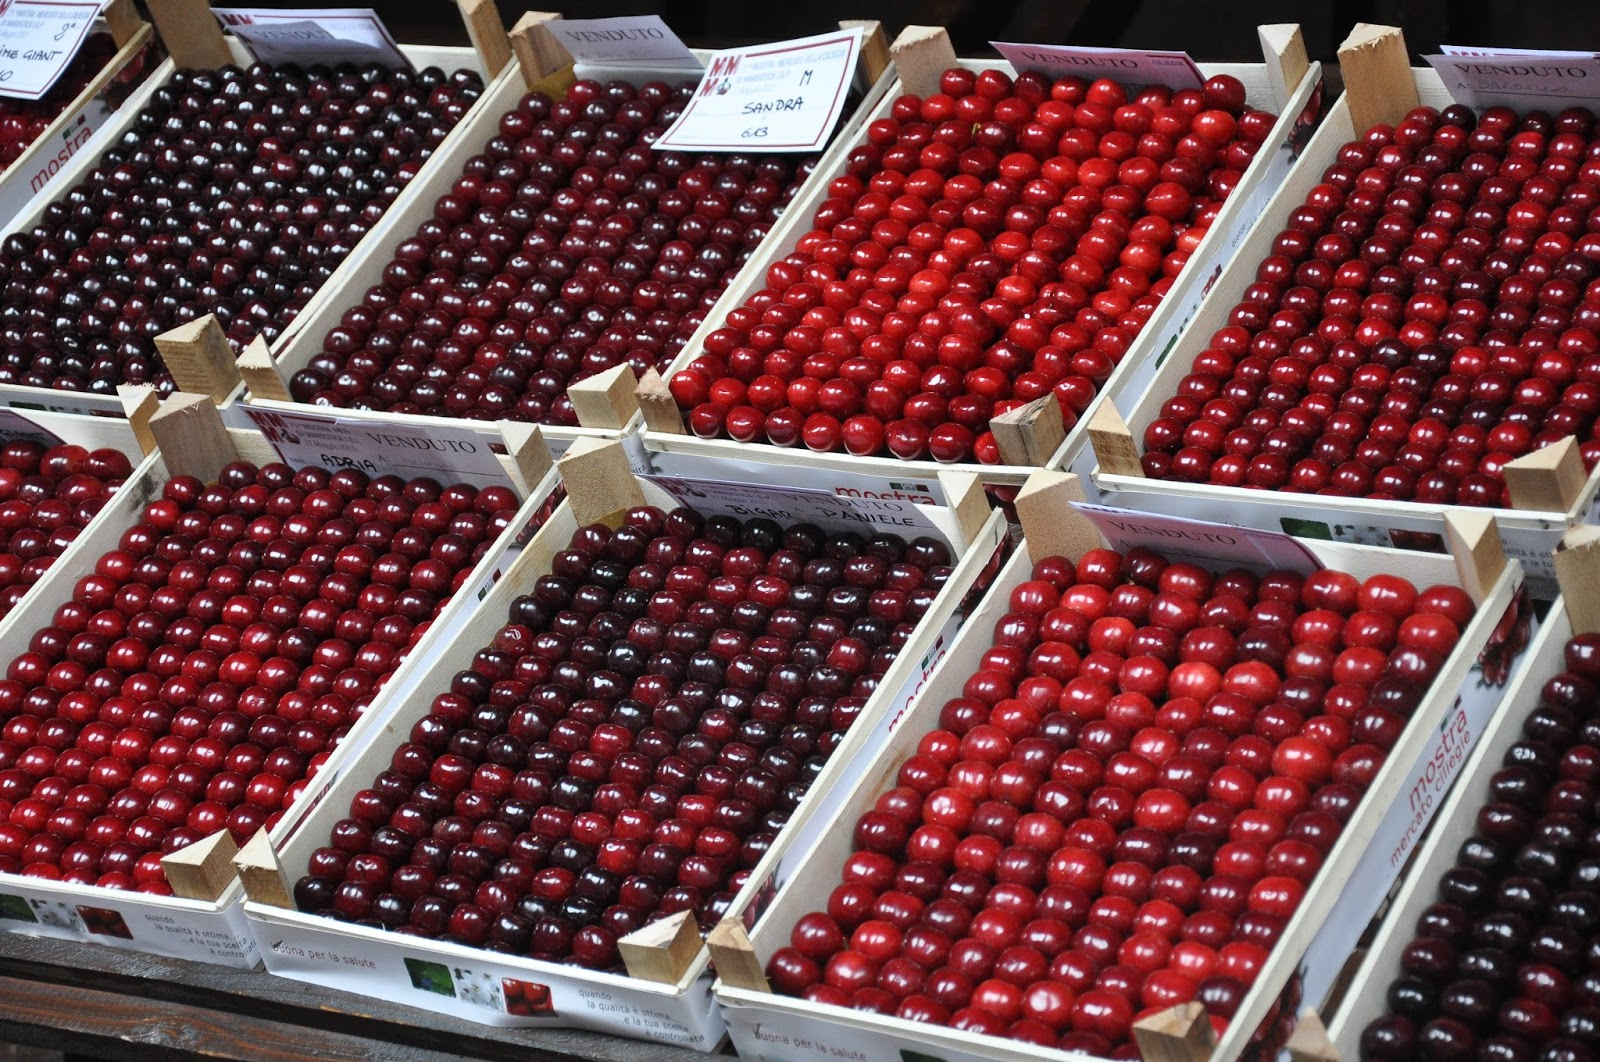 Crates of Premier Cherries, Cherry Show Market, Marostica, Veneto, Italy